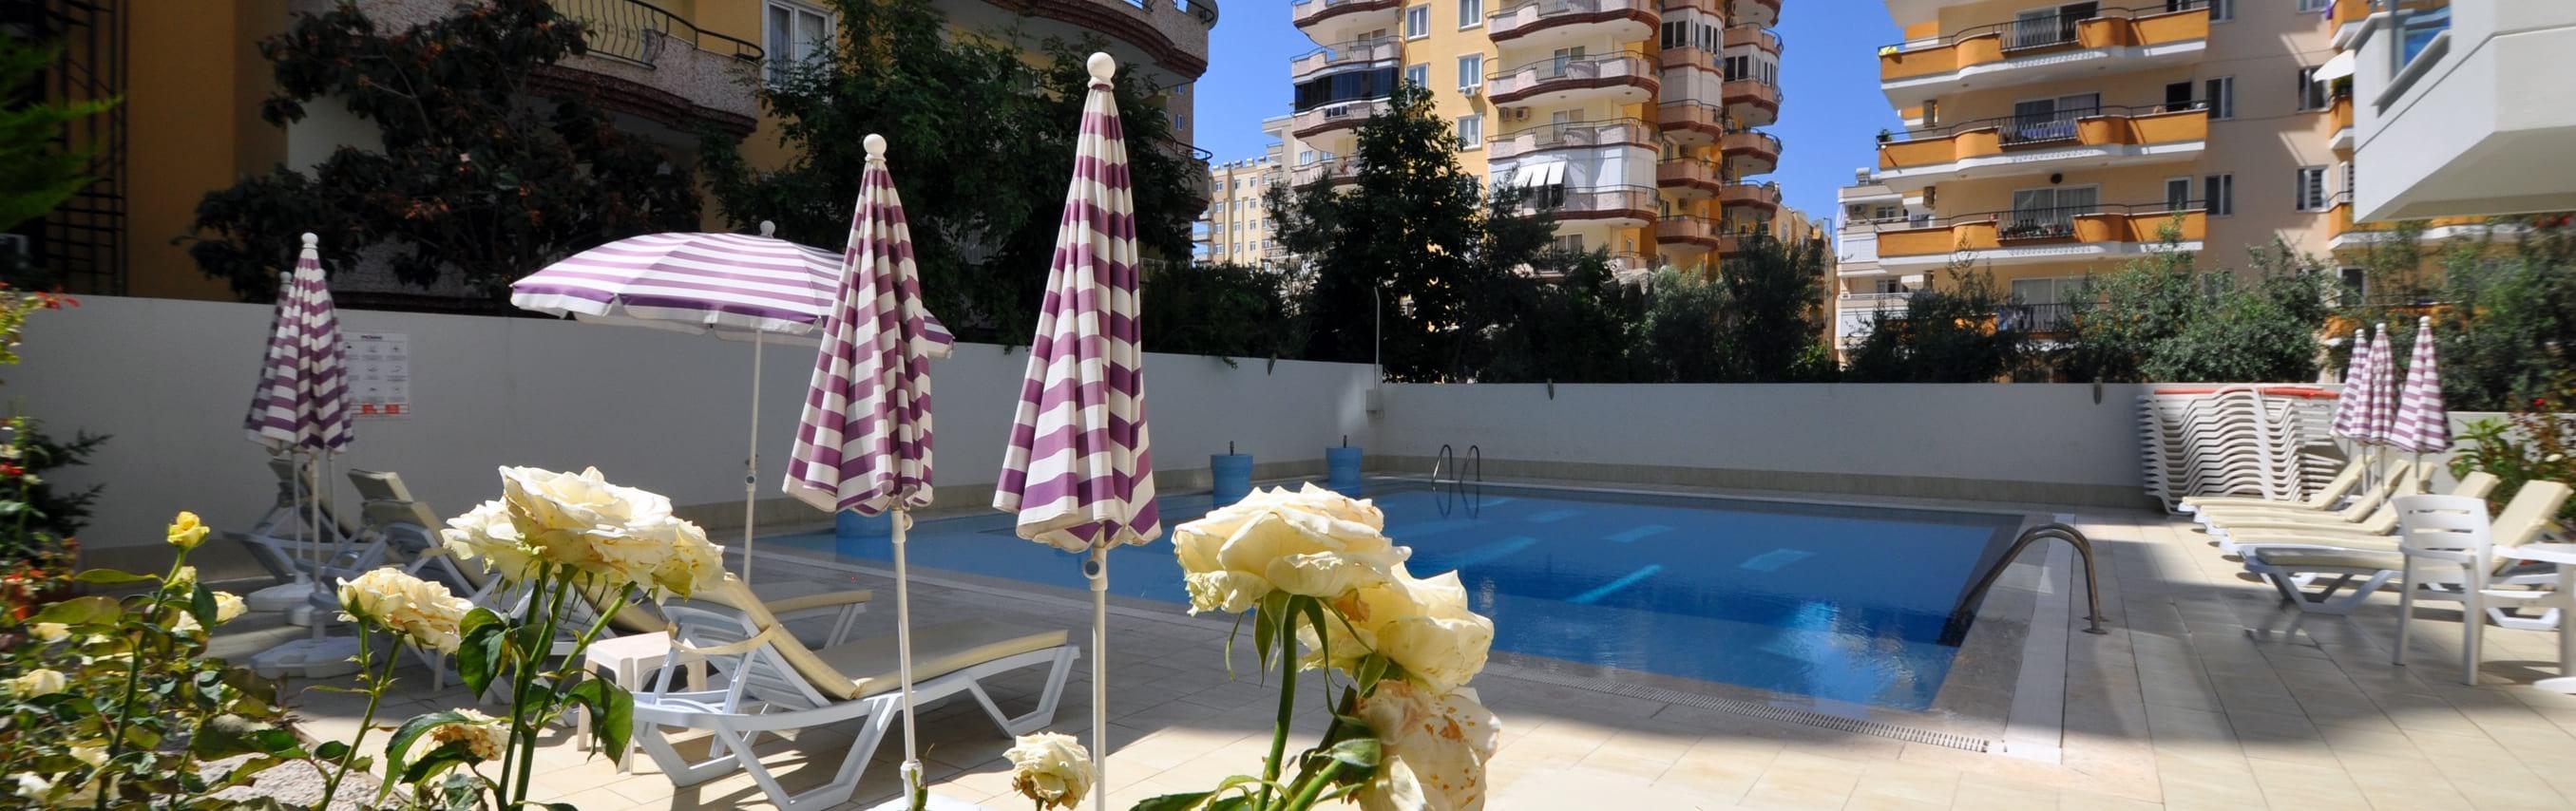 Yekta Atilim 2 penthouse